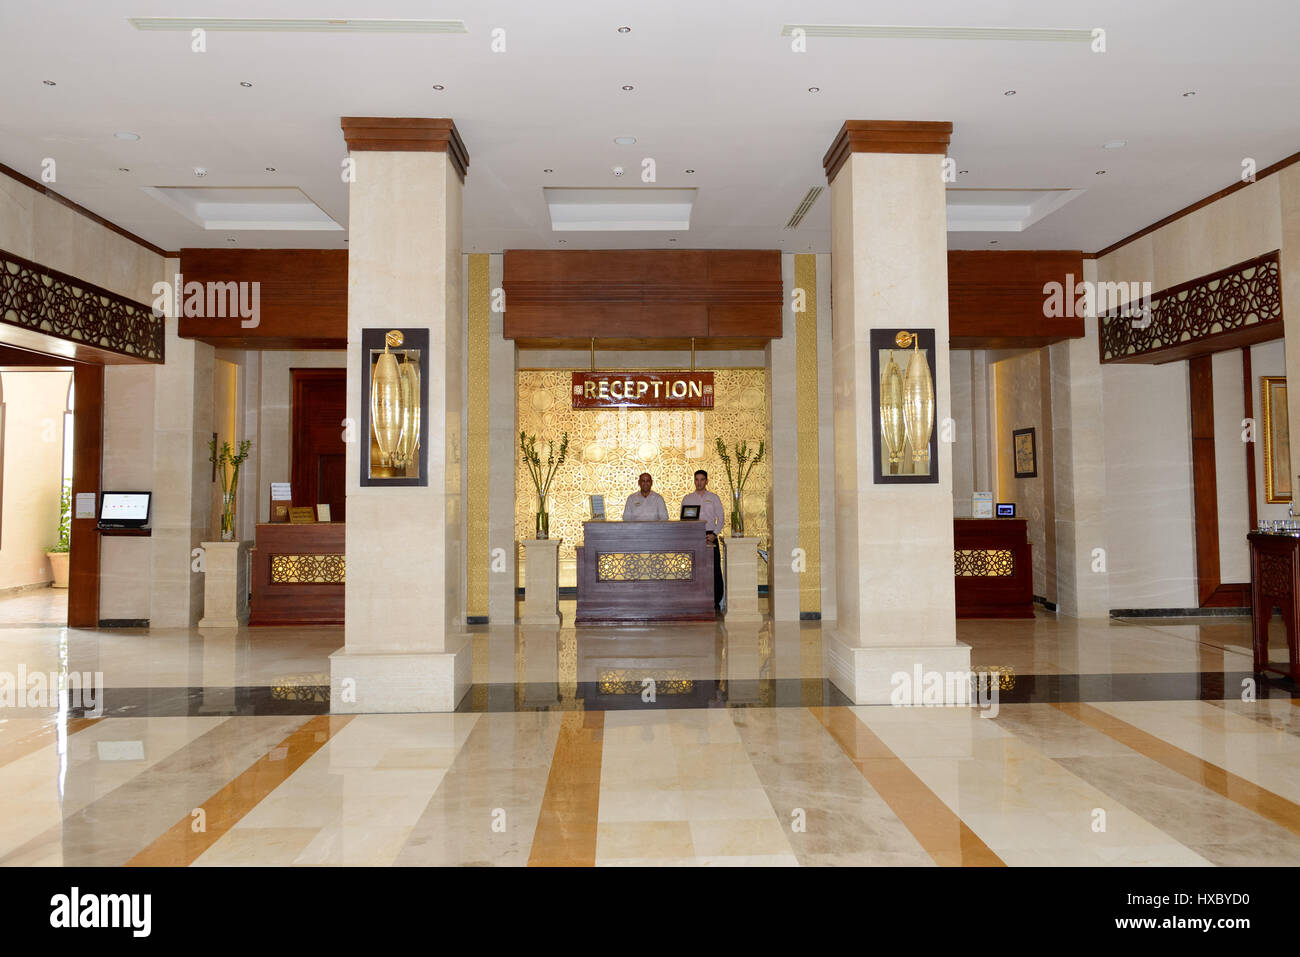 SHARM EL SHEIKH, EGYPT -  NOVEMBER 30: The lobby of Sunrise Arabian Beach Resort luxury hotel and smiling receptionists - Stock Image